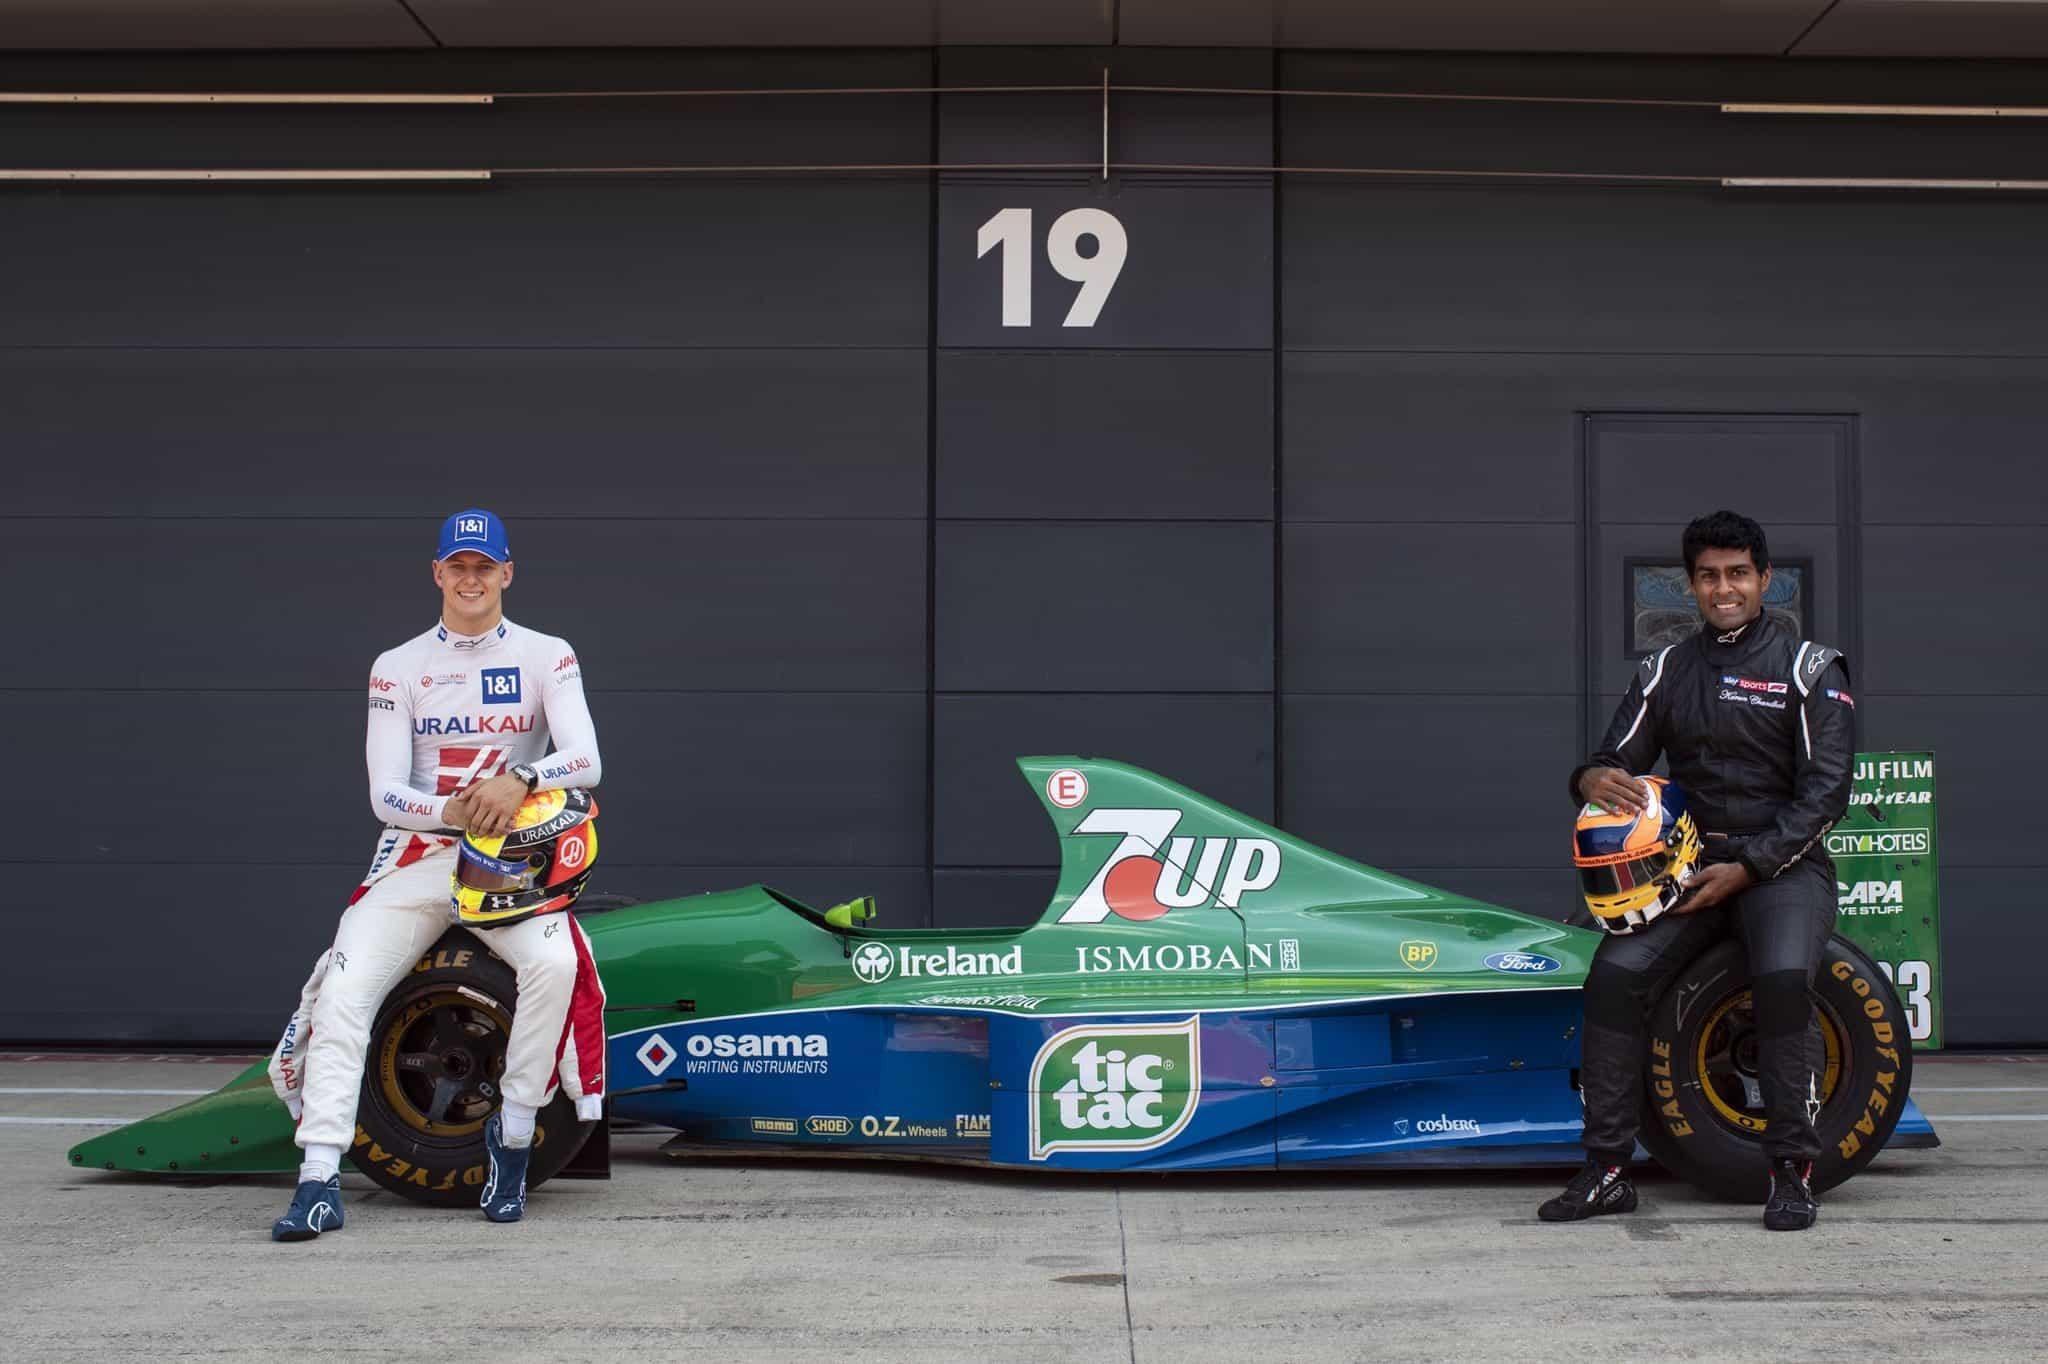 2021 British GP Mick Schumacher and Karun Chandok Jordan 191 Photo Haas